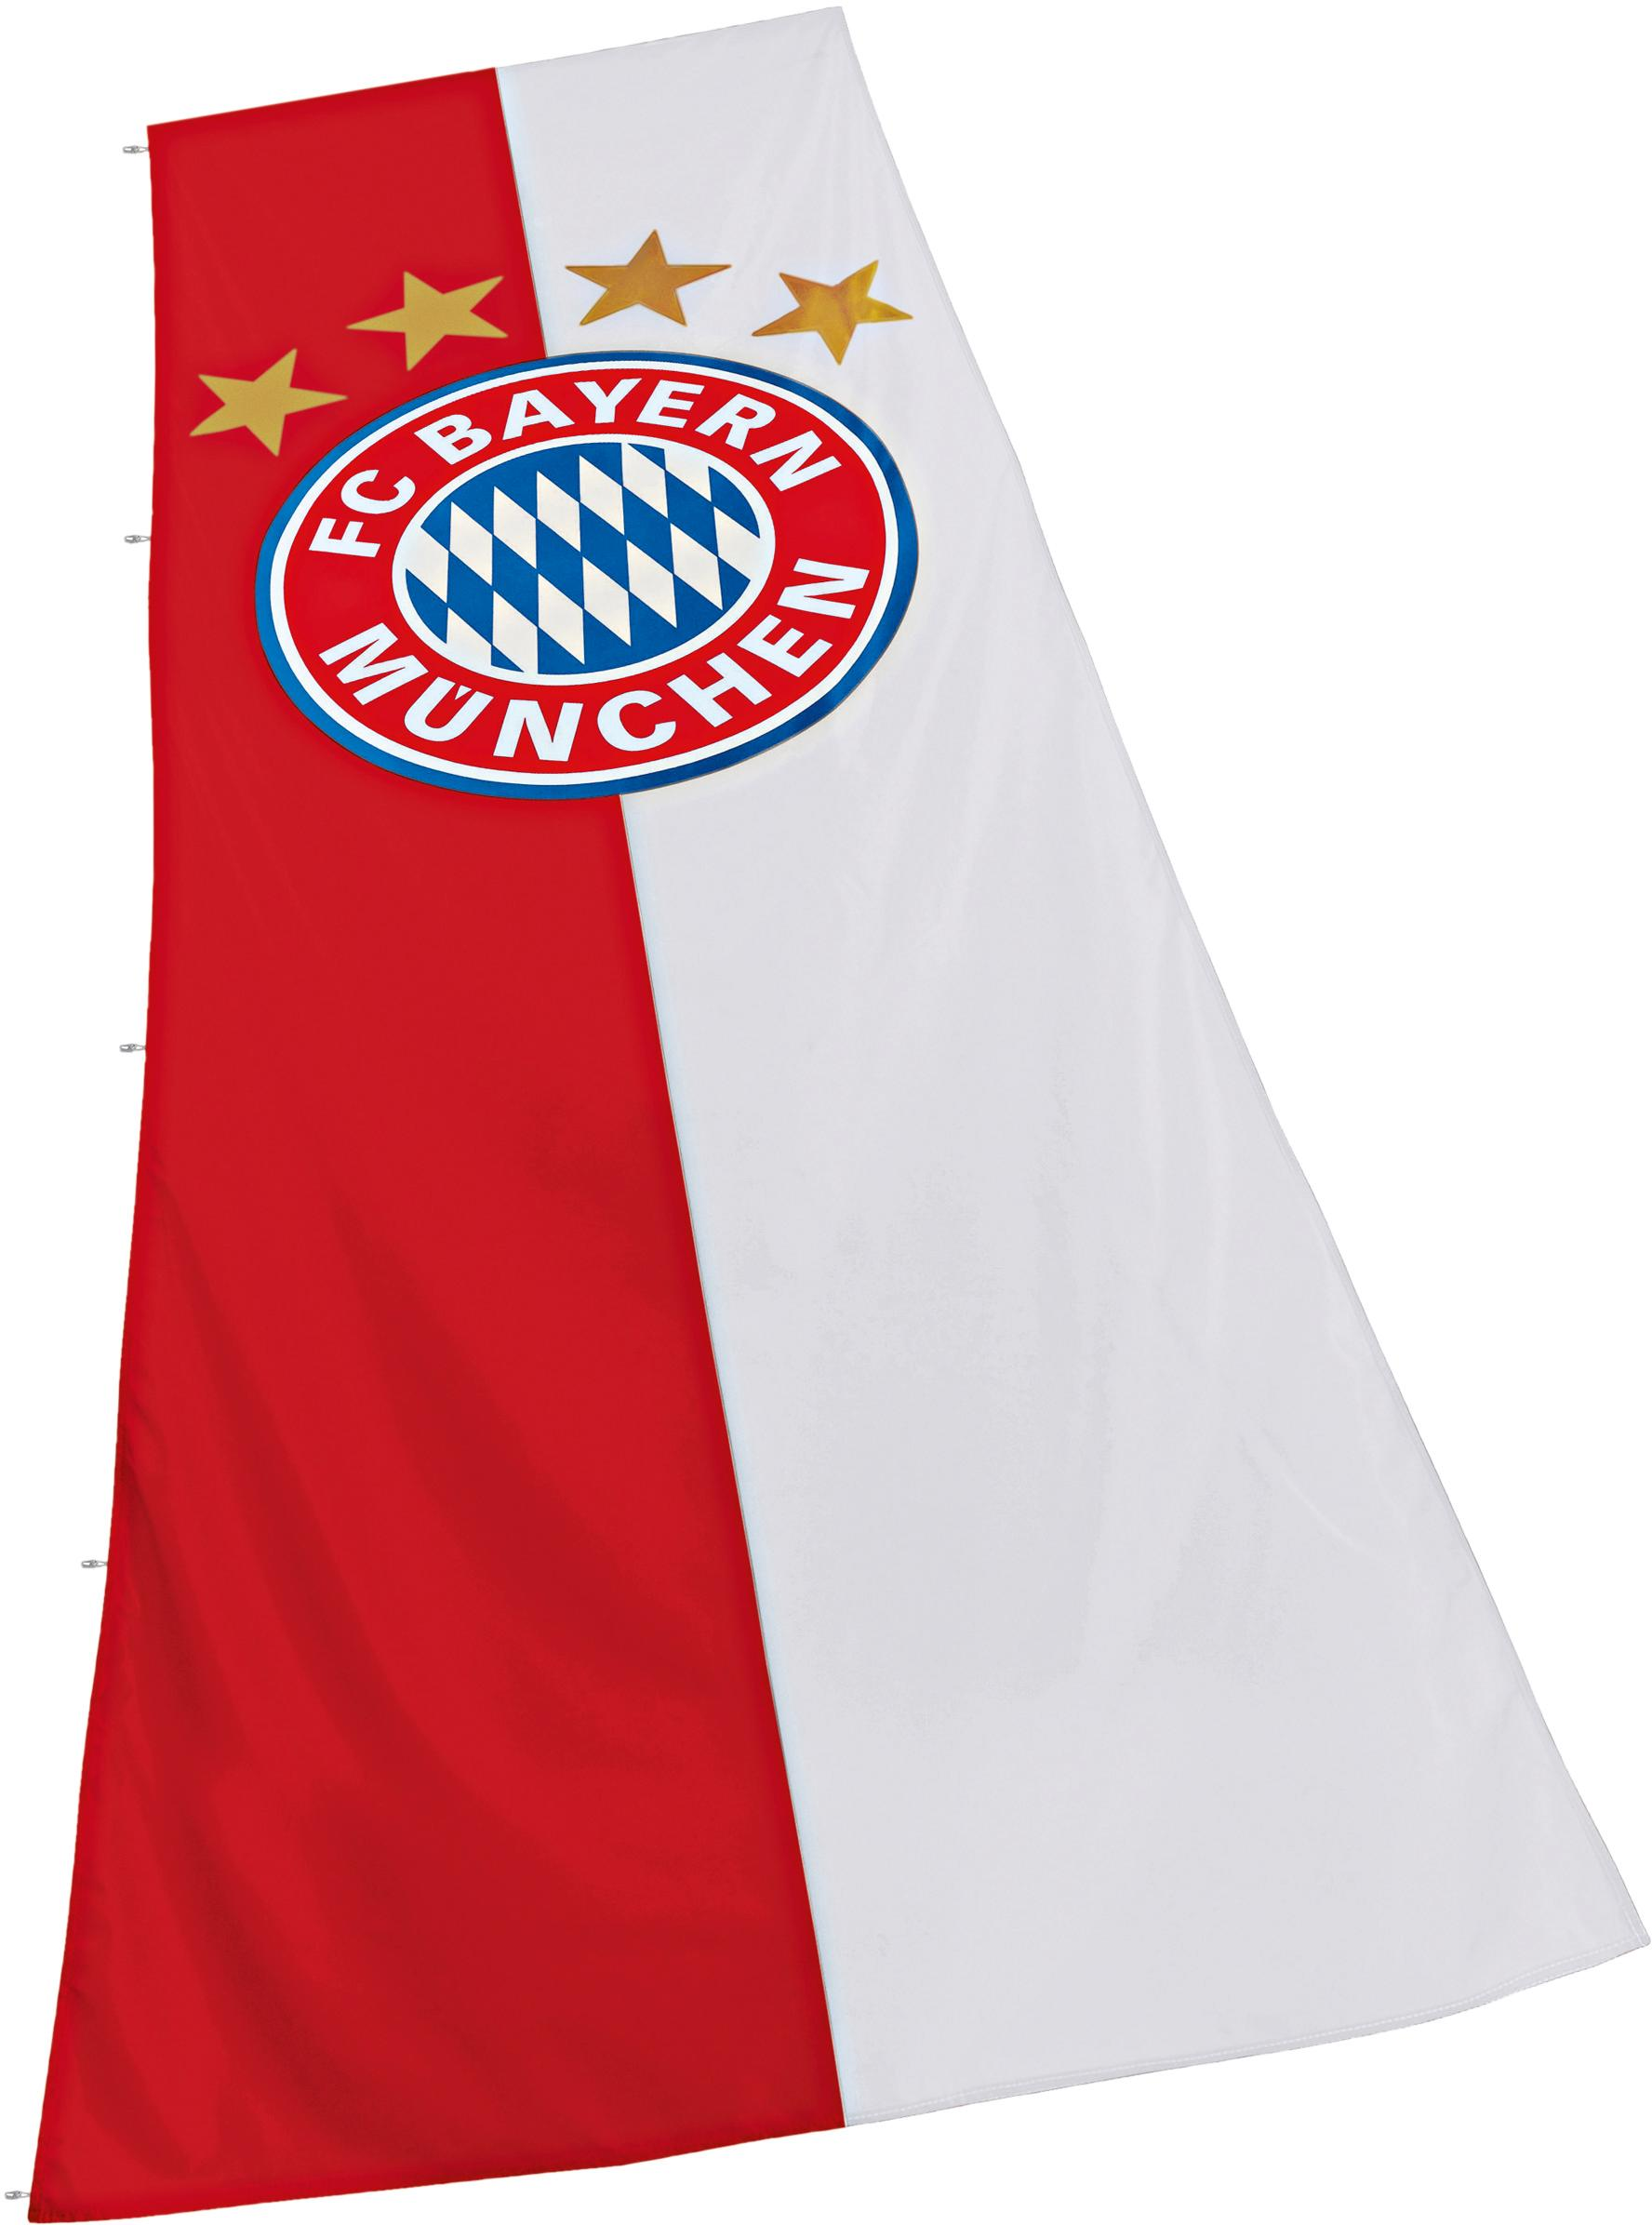 FC Bayern Fahne München Hissfahne mit Logo rot Kinder Bundesliga-Fanshop Fanartikel Fahnen